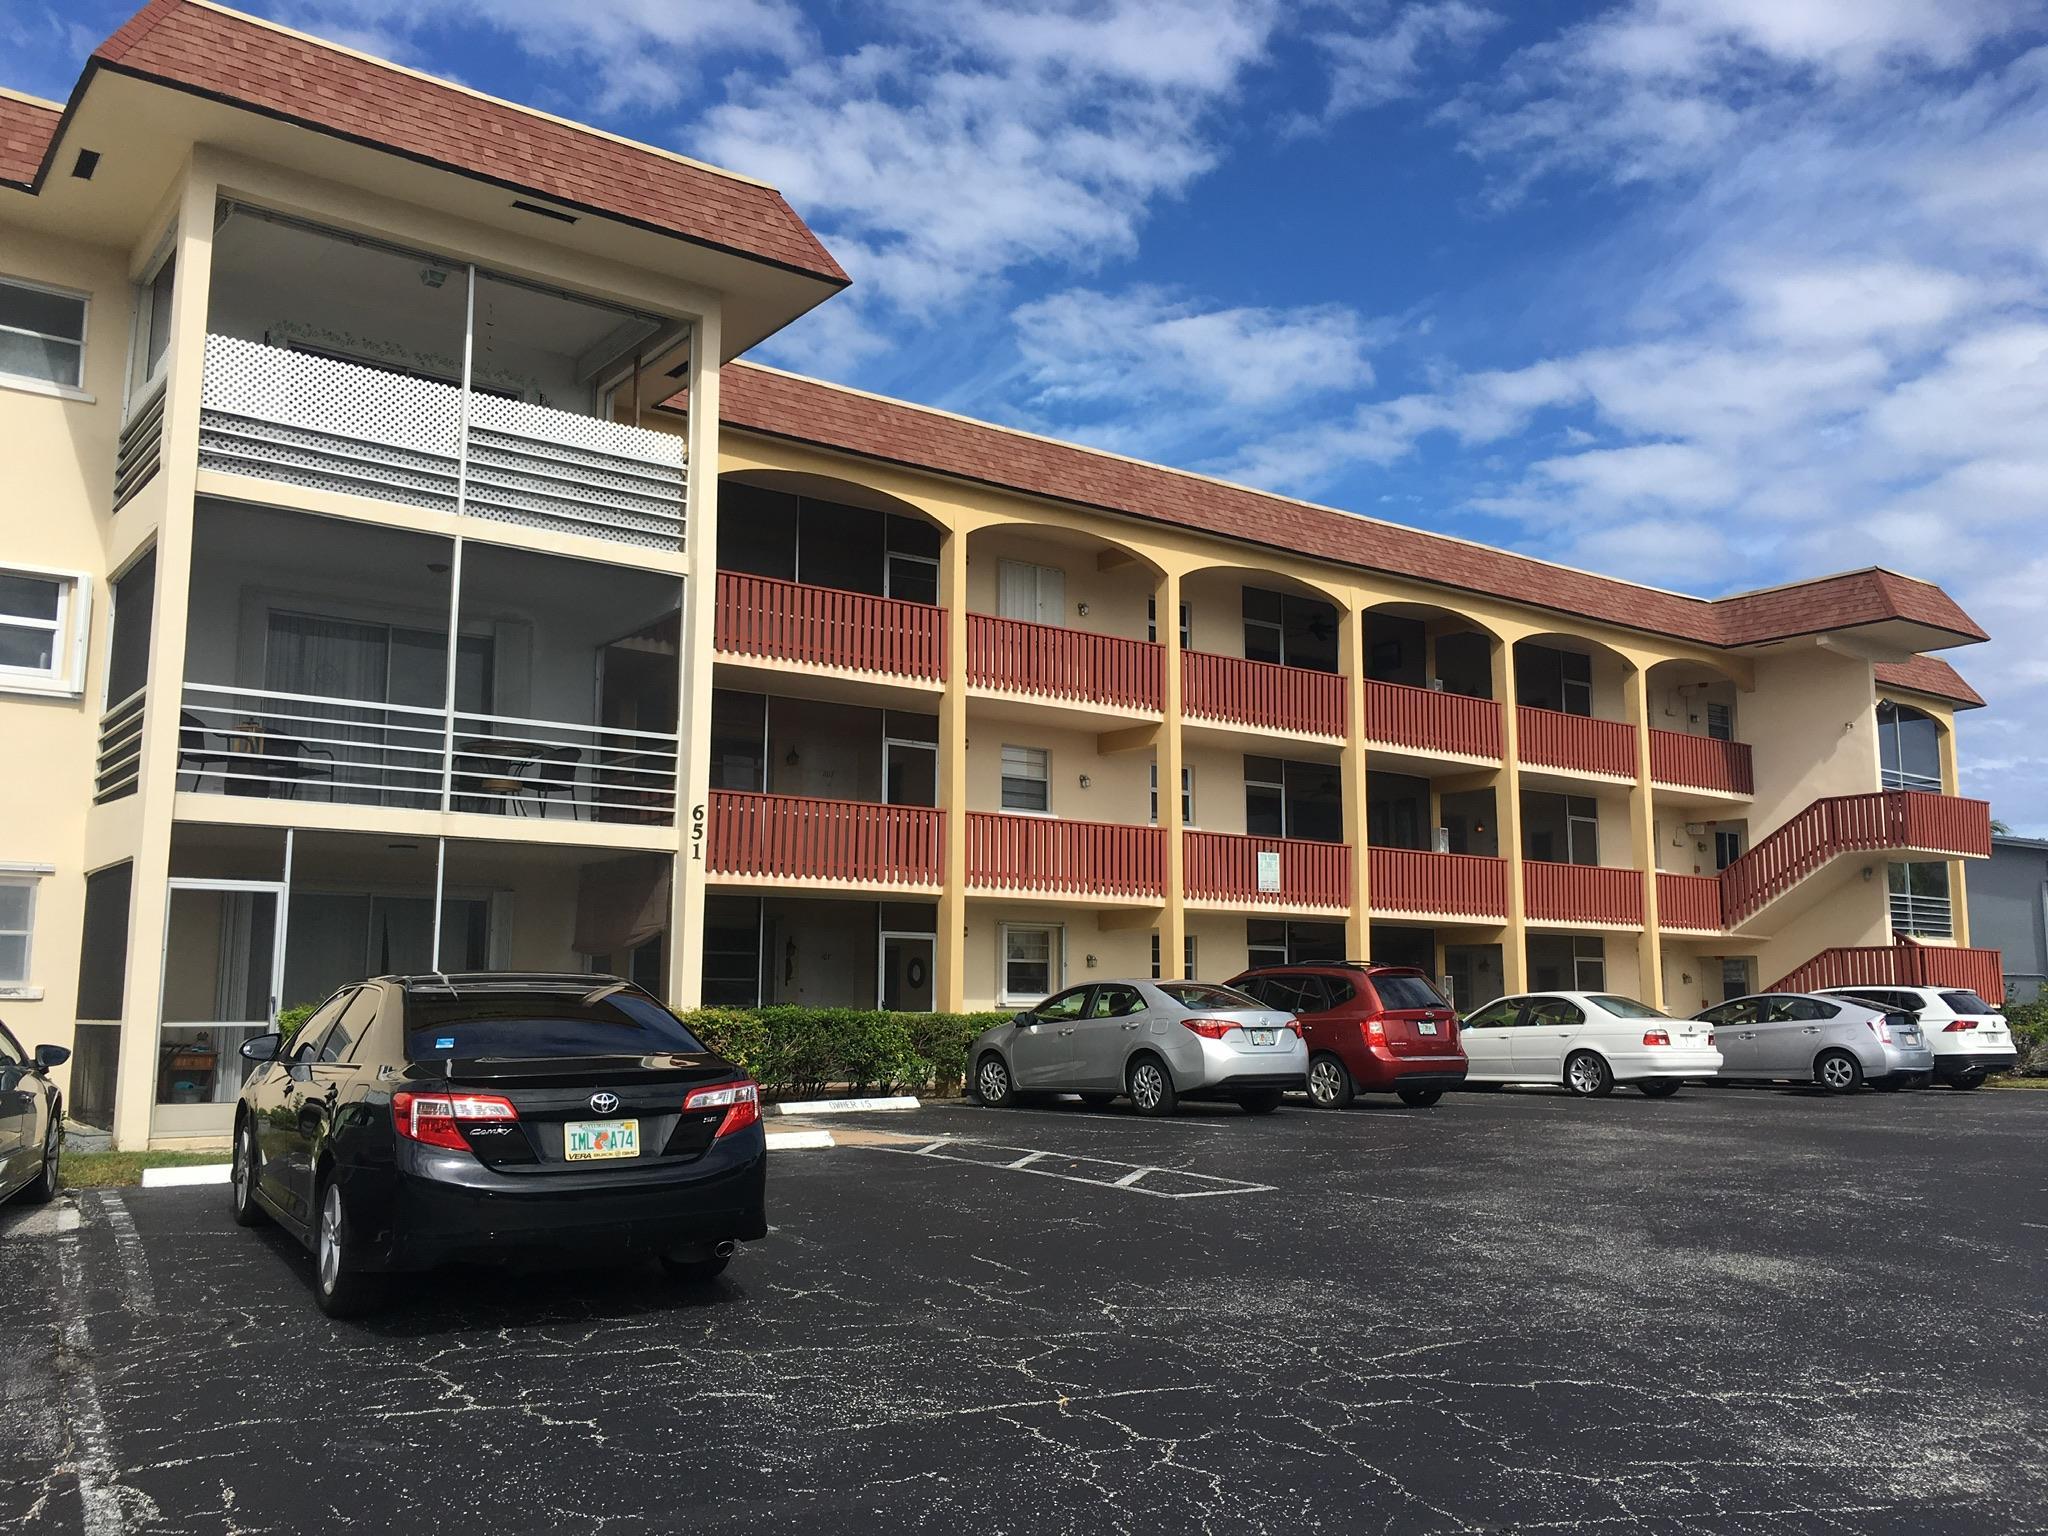 Details for 651 Pine Drive 209, Pompano Beach, FL 33060